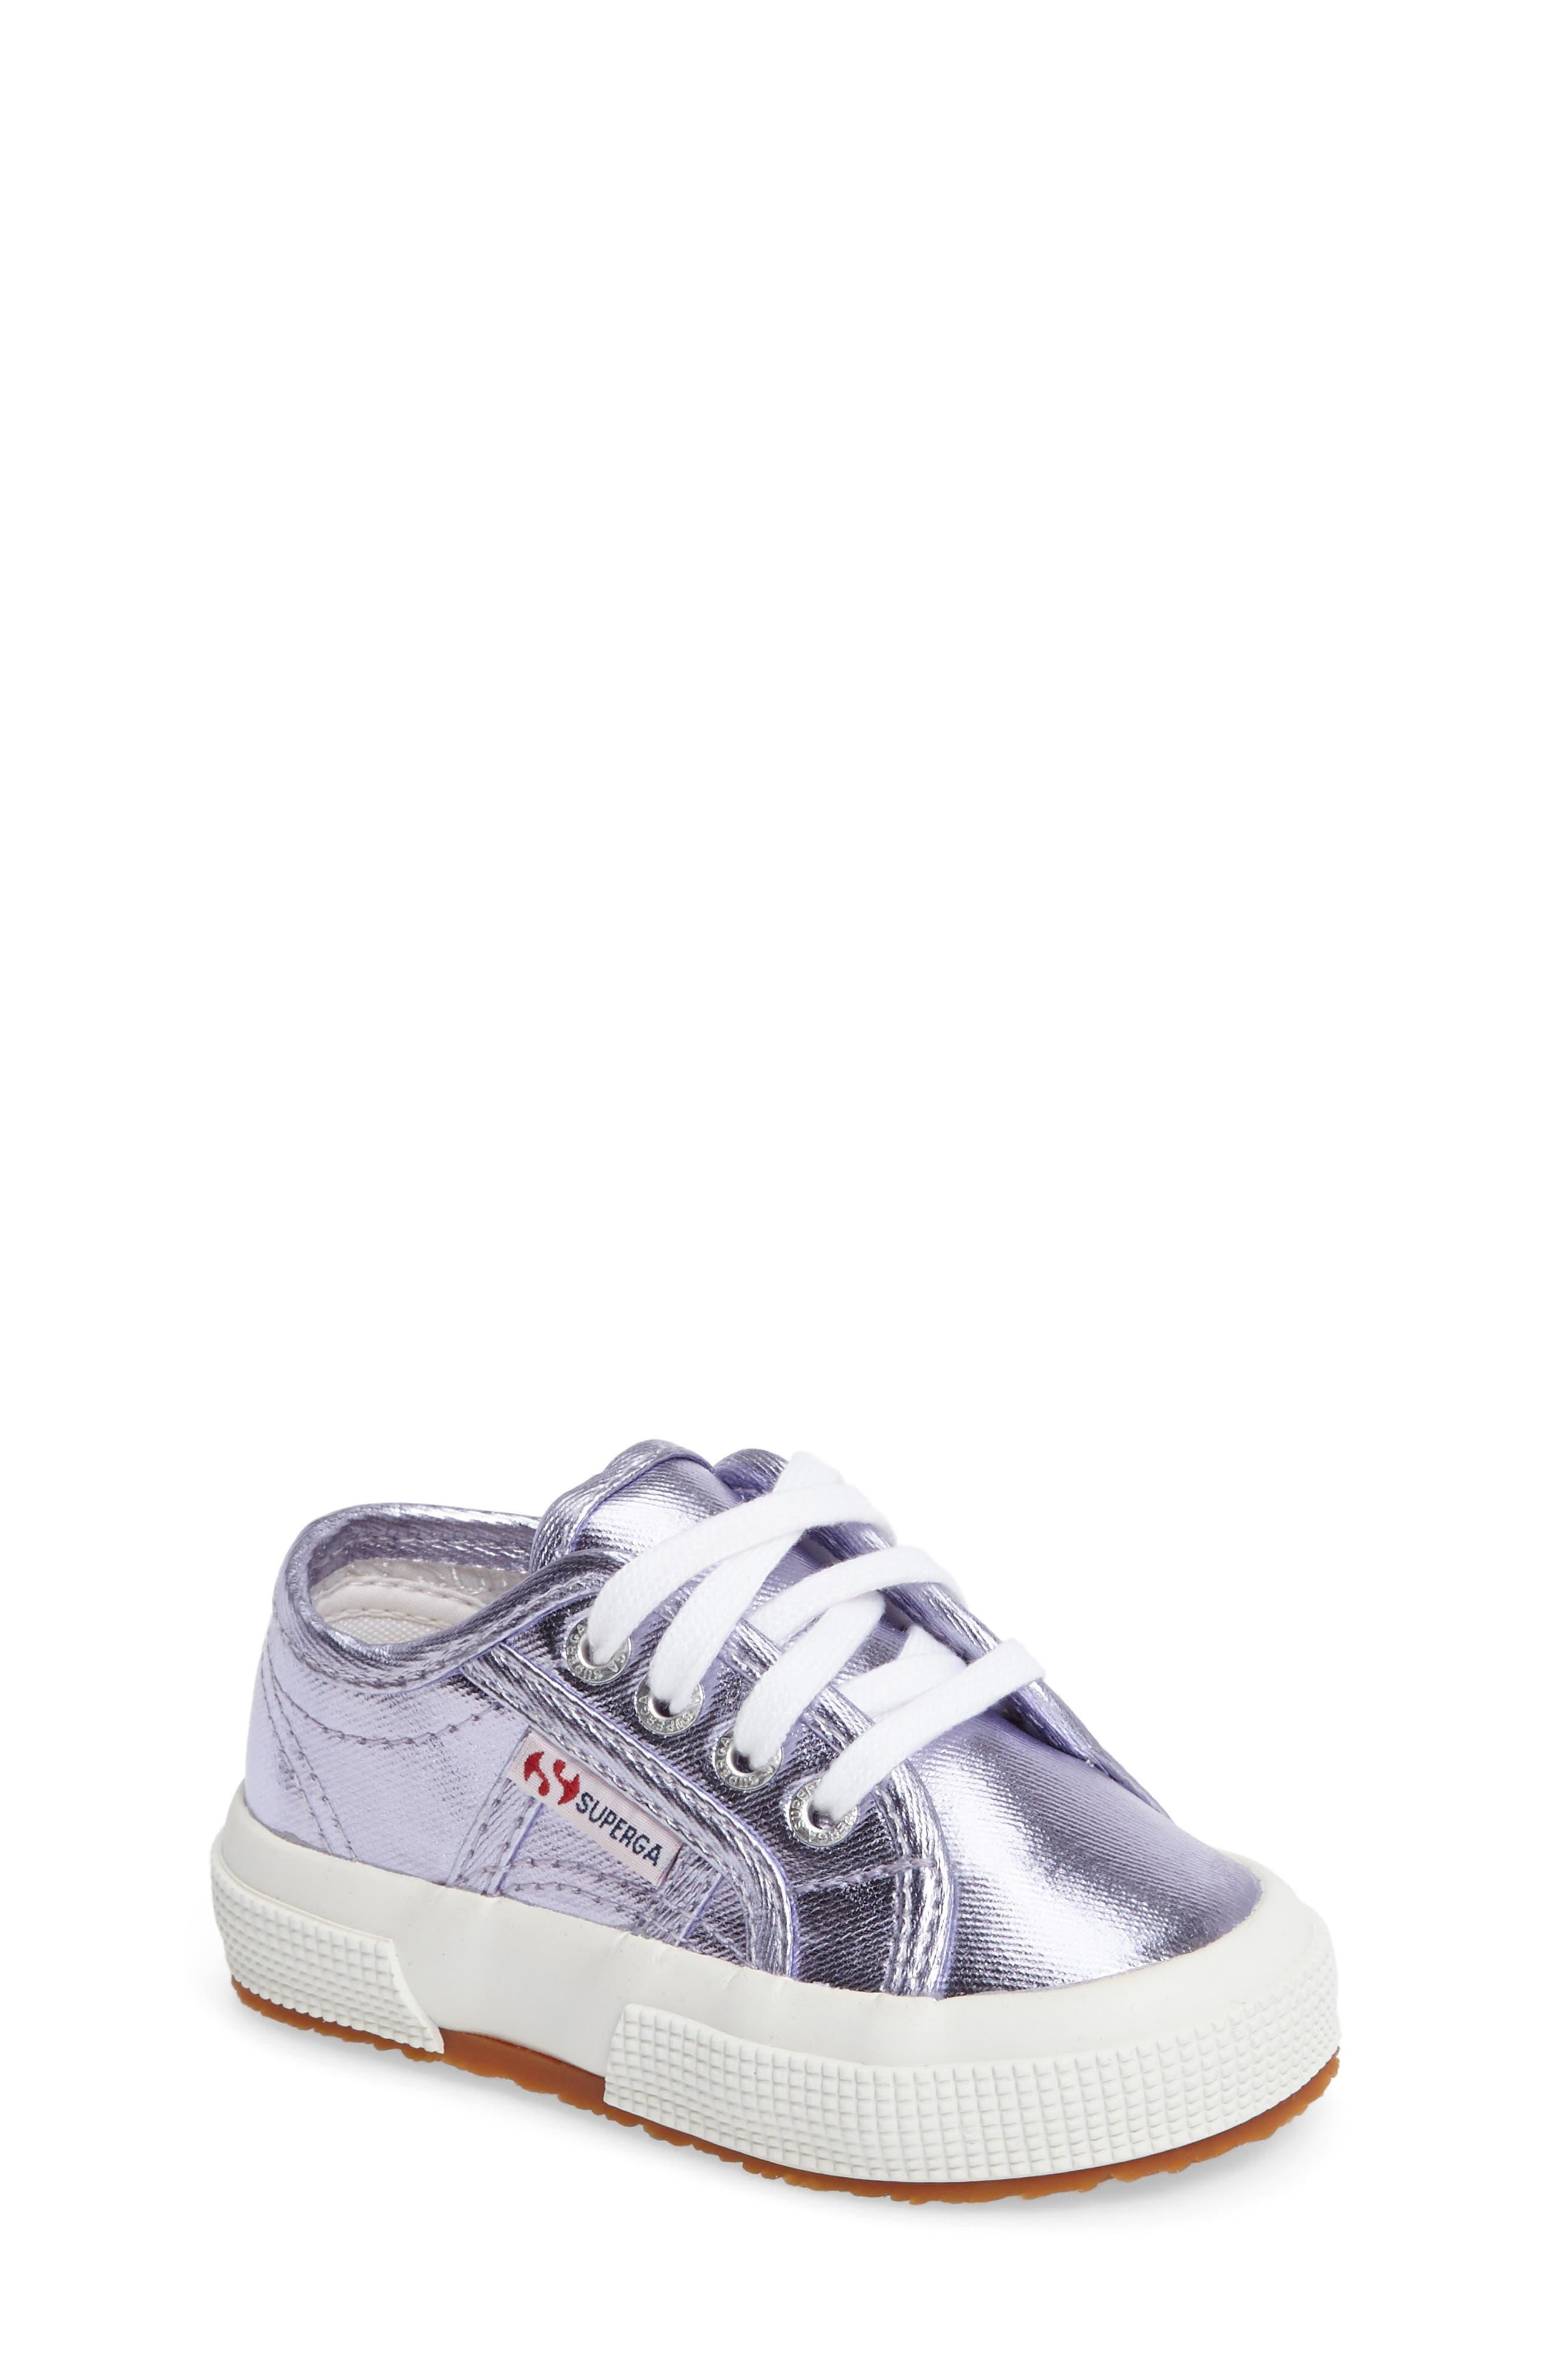 Superga Metallic Sneaker (Walker, Toddler & Little Kid)